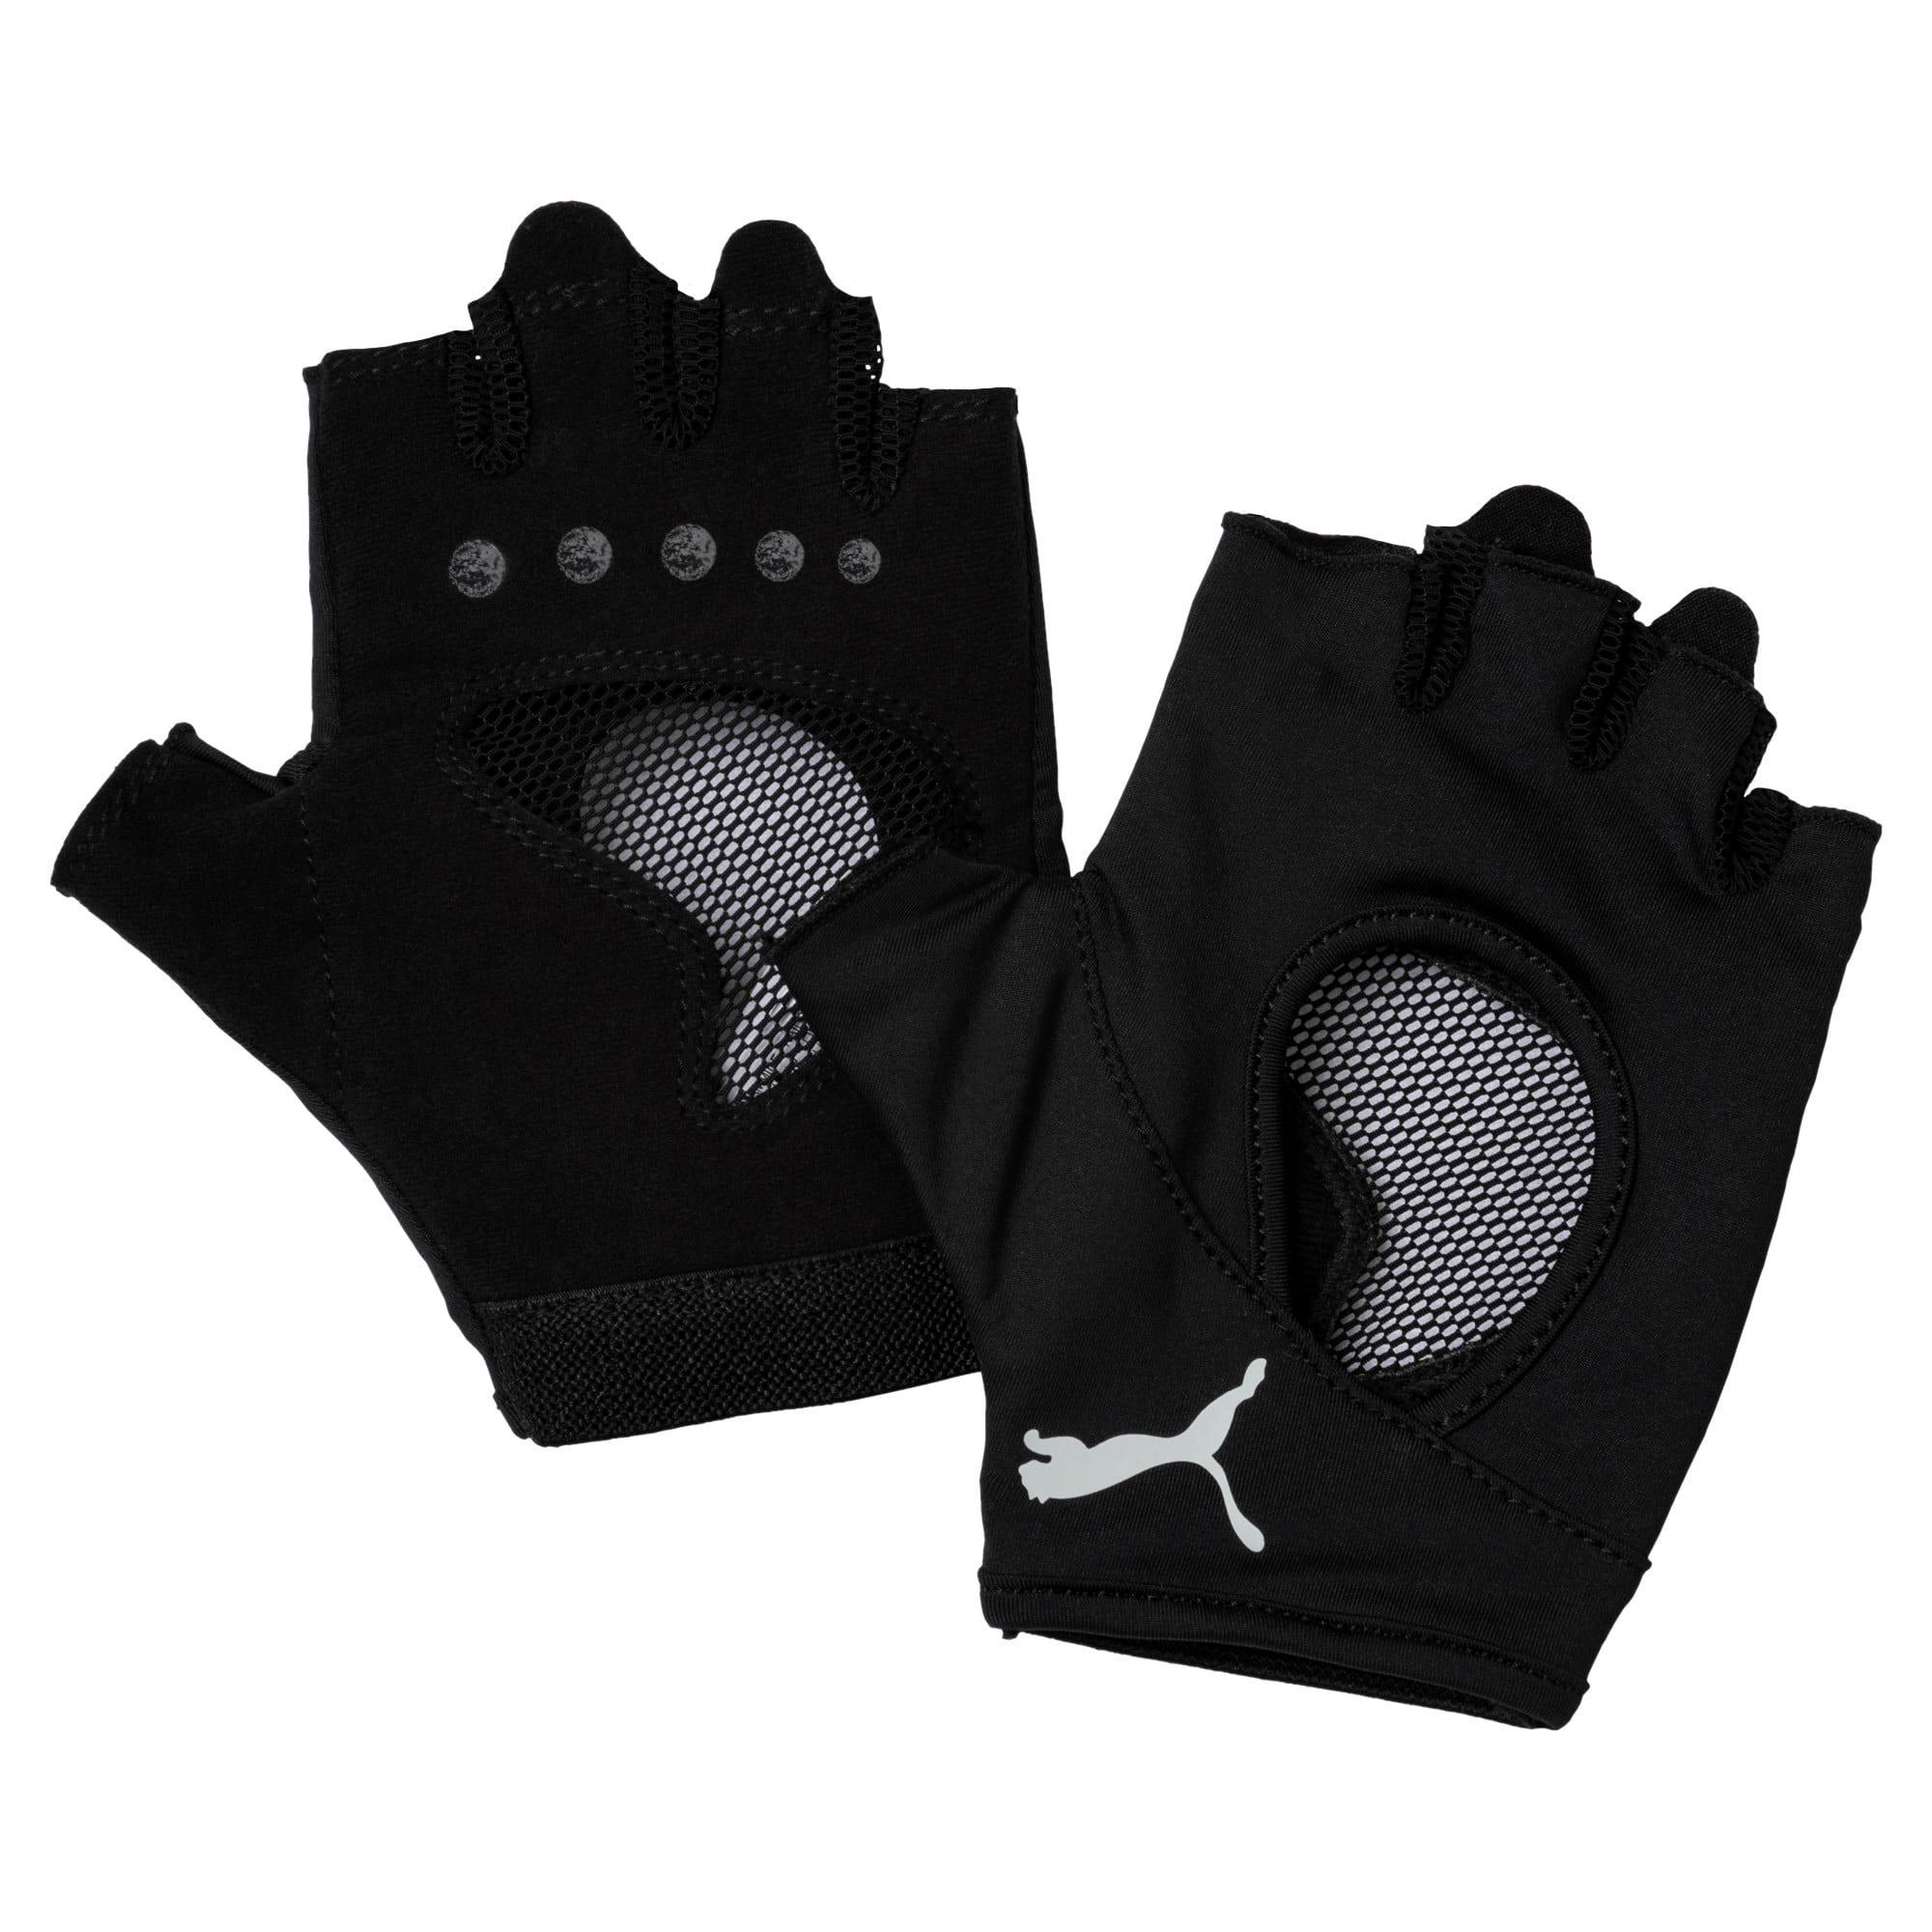 Thumbnail 1 of Women's Training Gym Gloves, Puma Black-Gray Violet, medium-IND